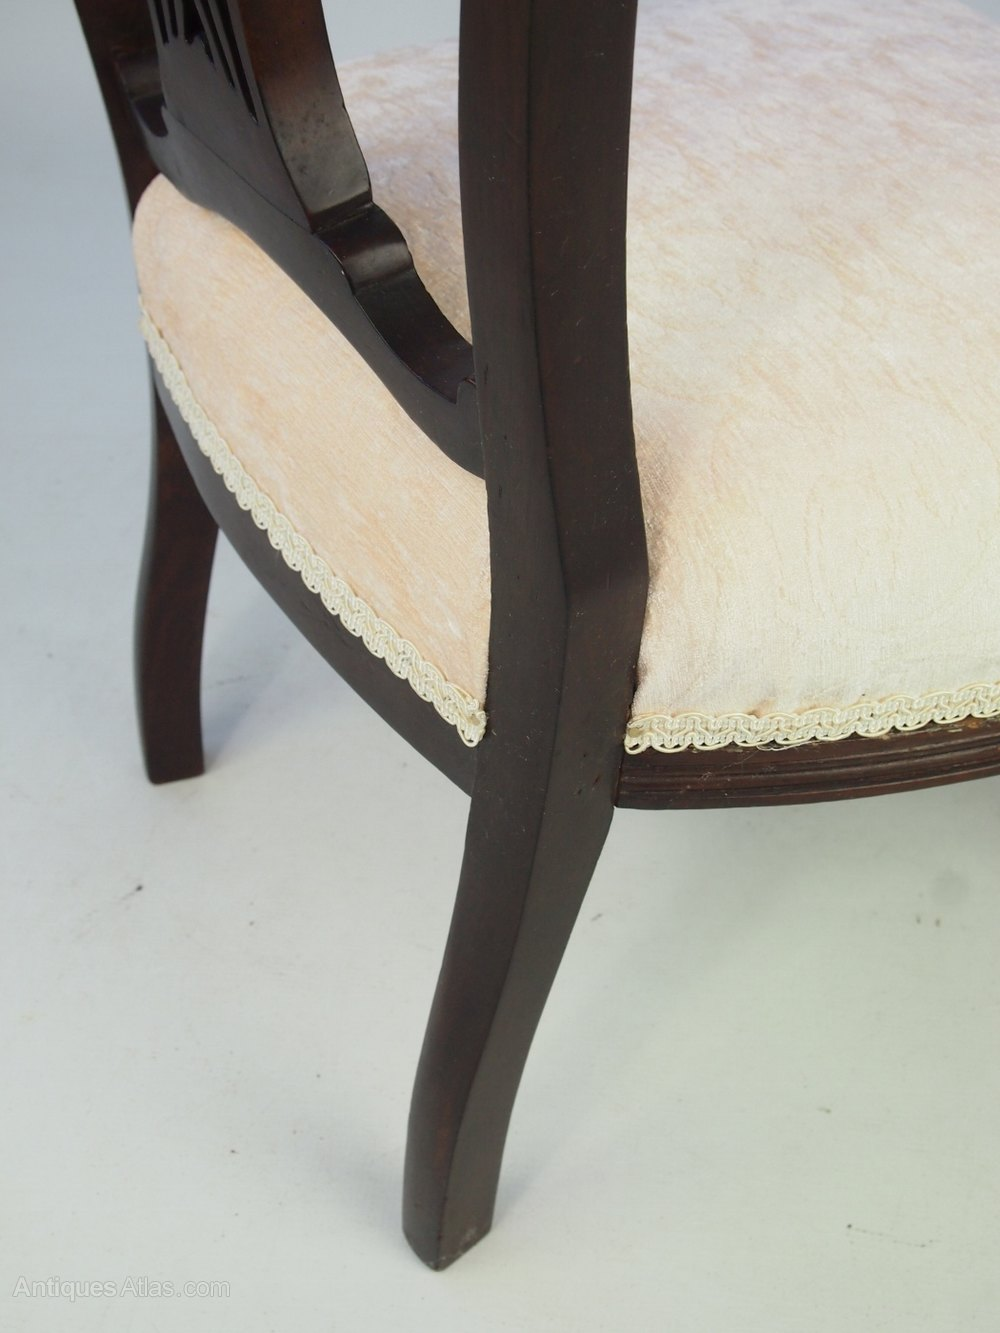 ... Dressing Table Chair Nursing Chair Hall Chair %%alt5%% ...